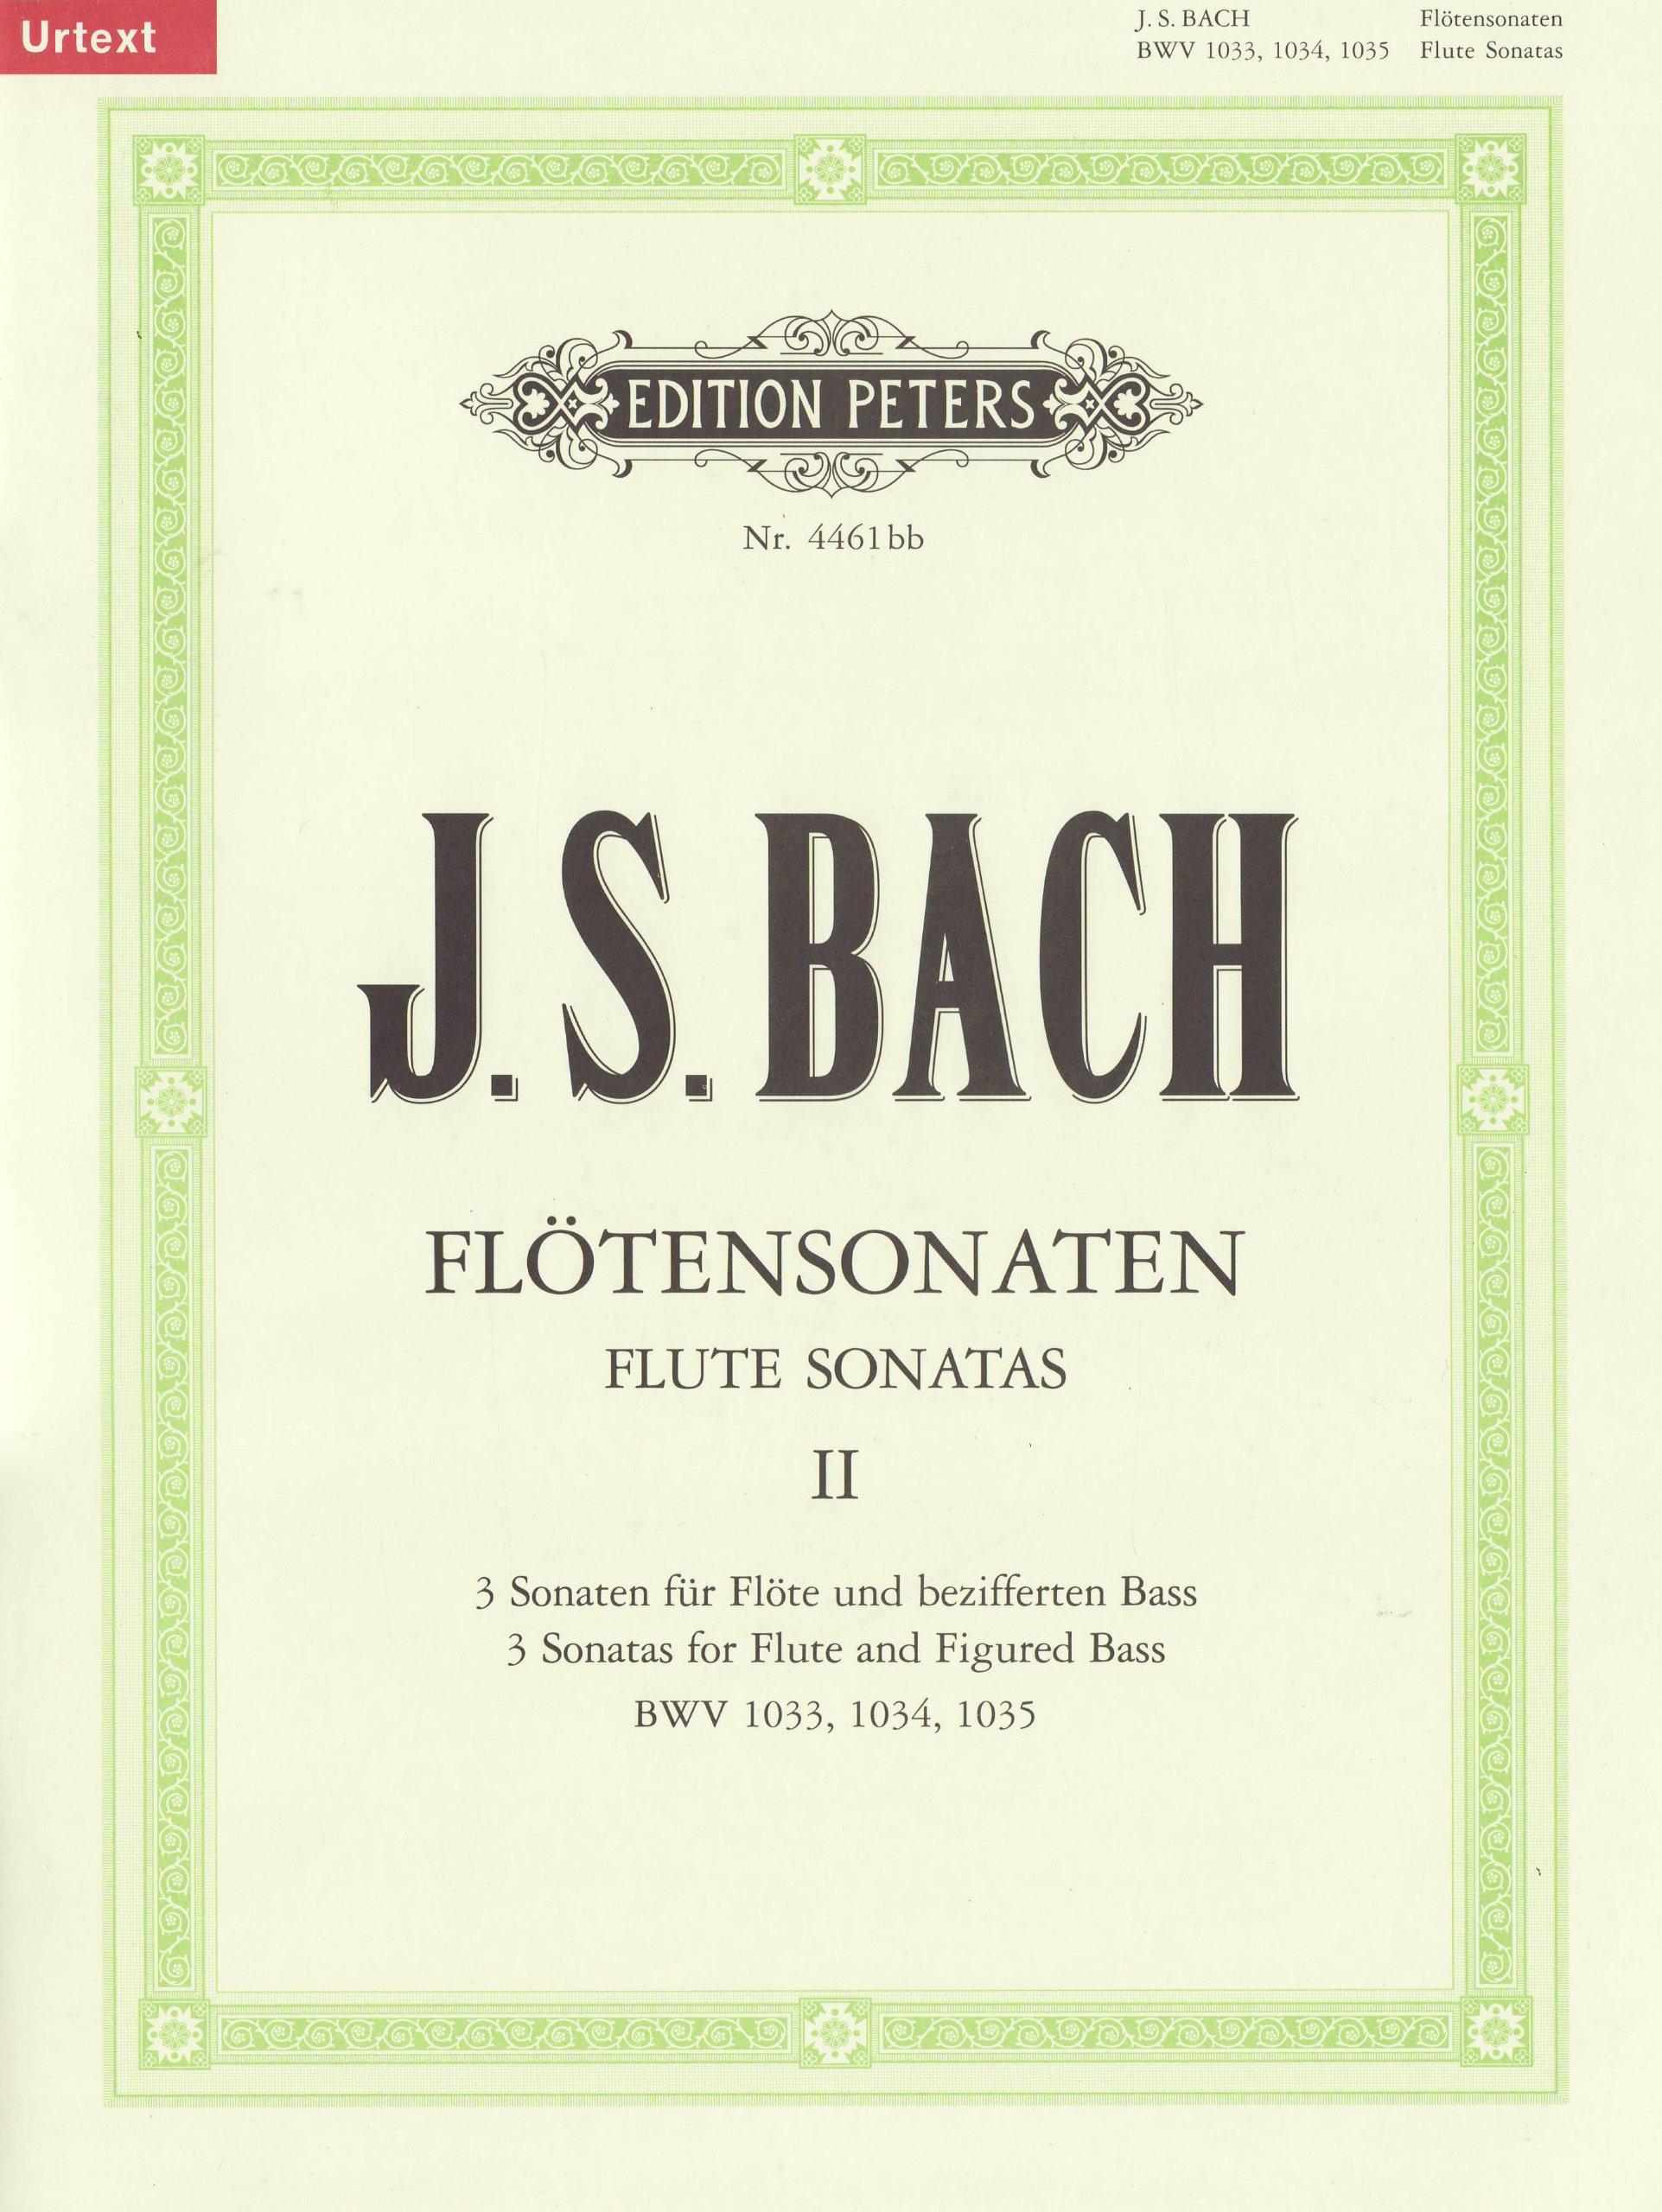 Sonates Volume 2 Bwv1033-35 - Fl/Po (Allemand) Brochure – 1 janvier 2009 Johann Sebastian Bach Peters B0009XZT9A Musikalien